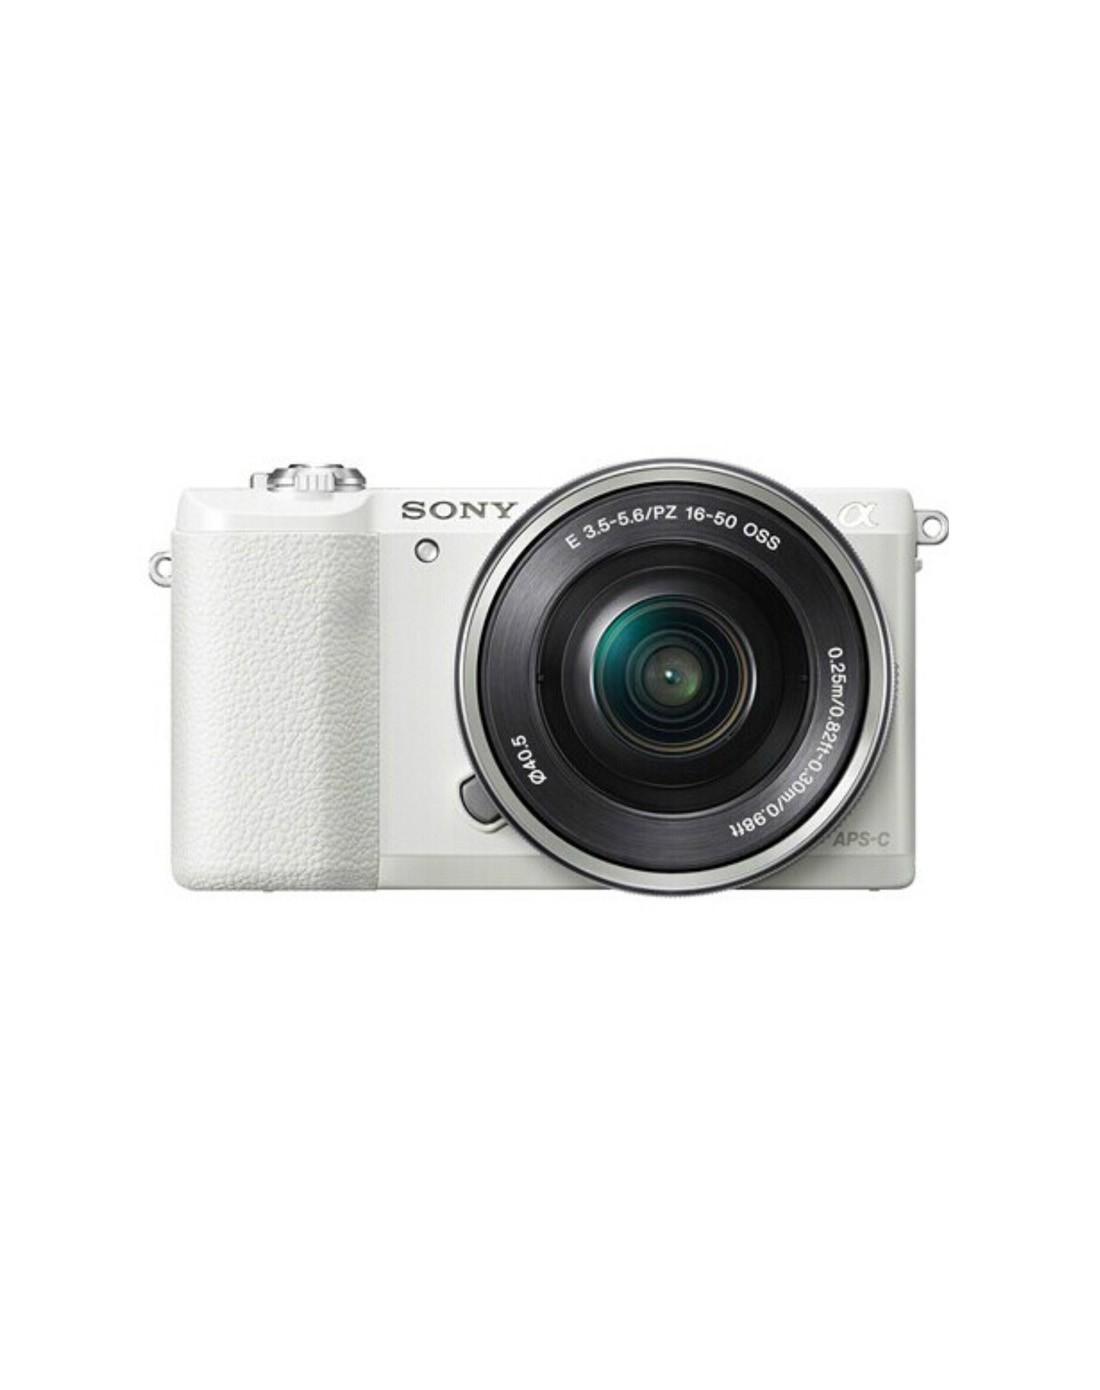 �9��y�-��-��)��,yl#�+_> 索尼微单相机ilce-5100l/白